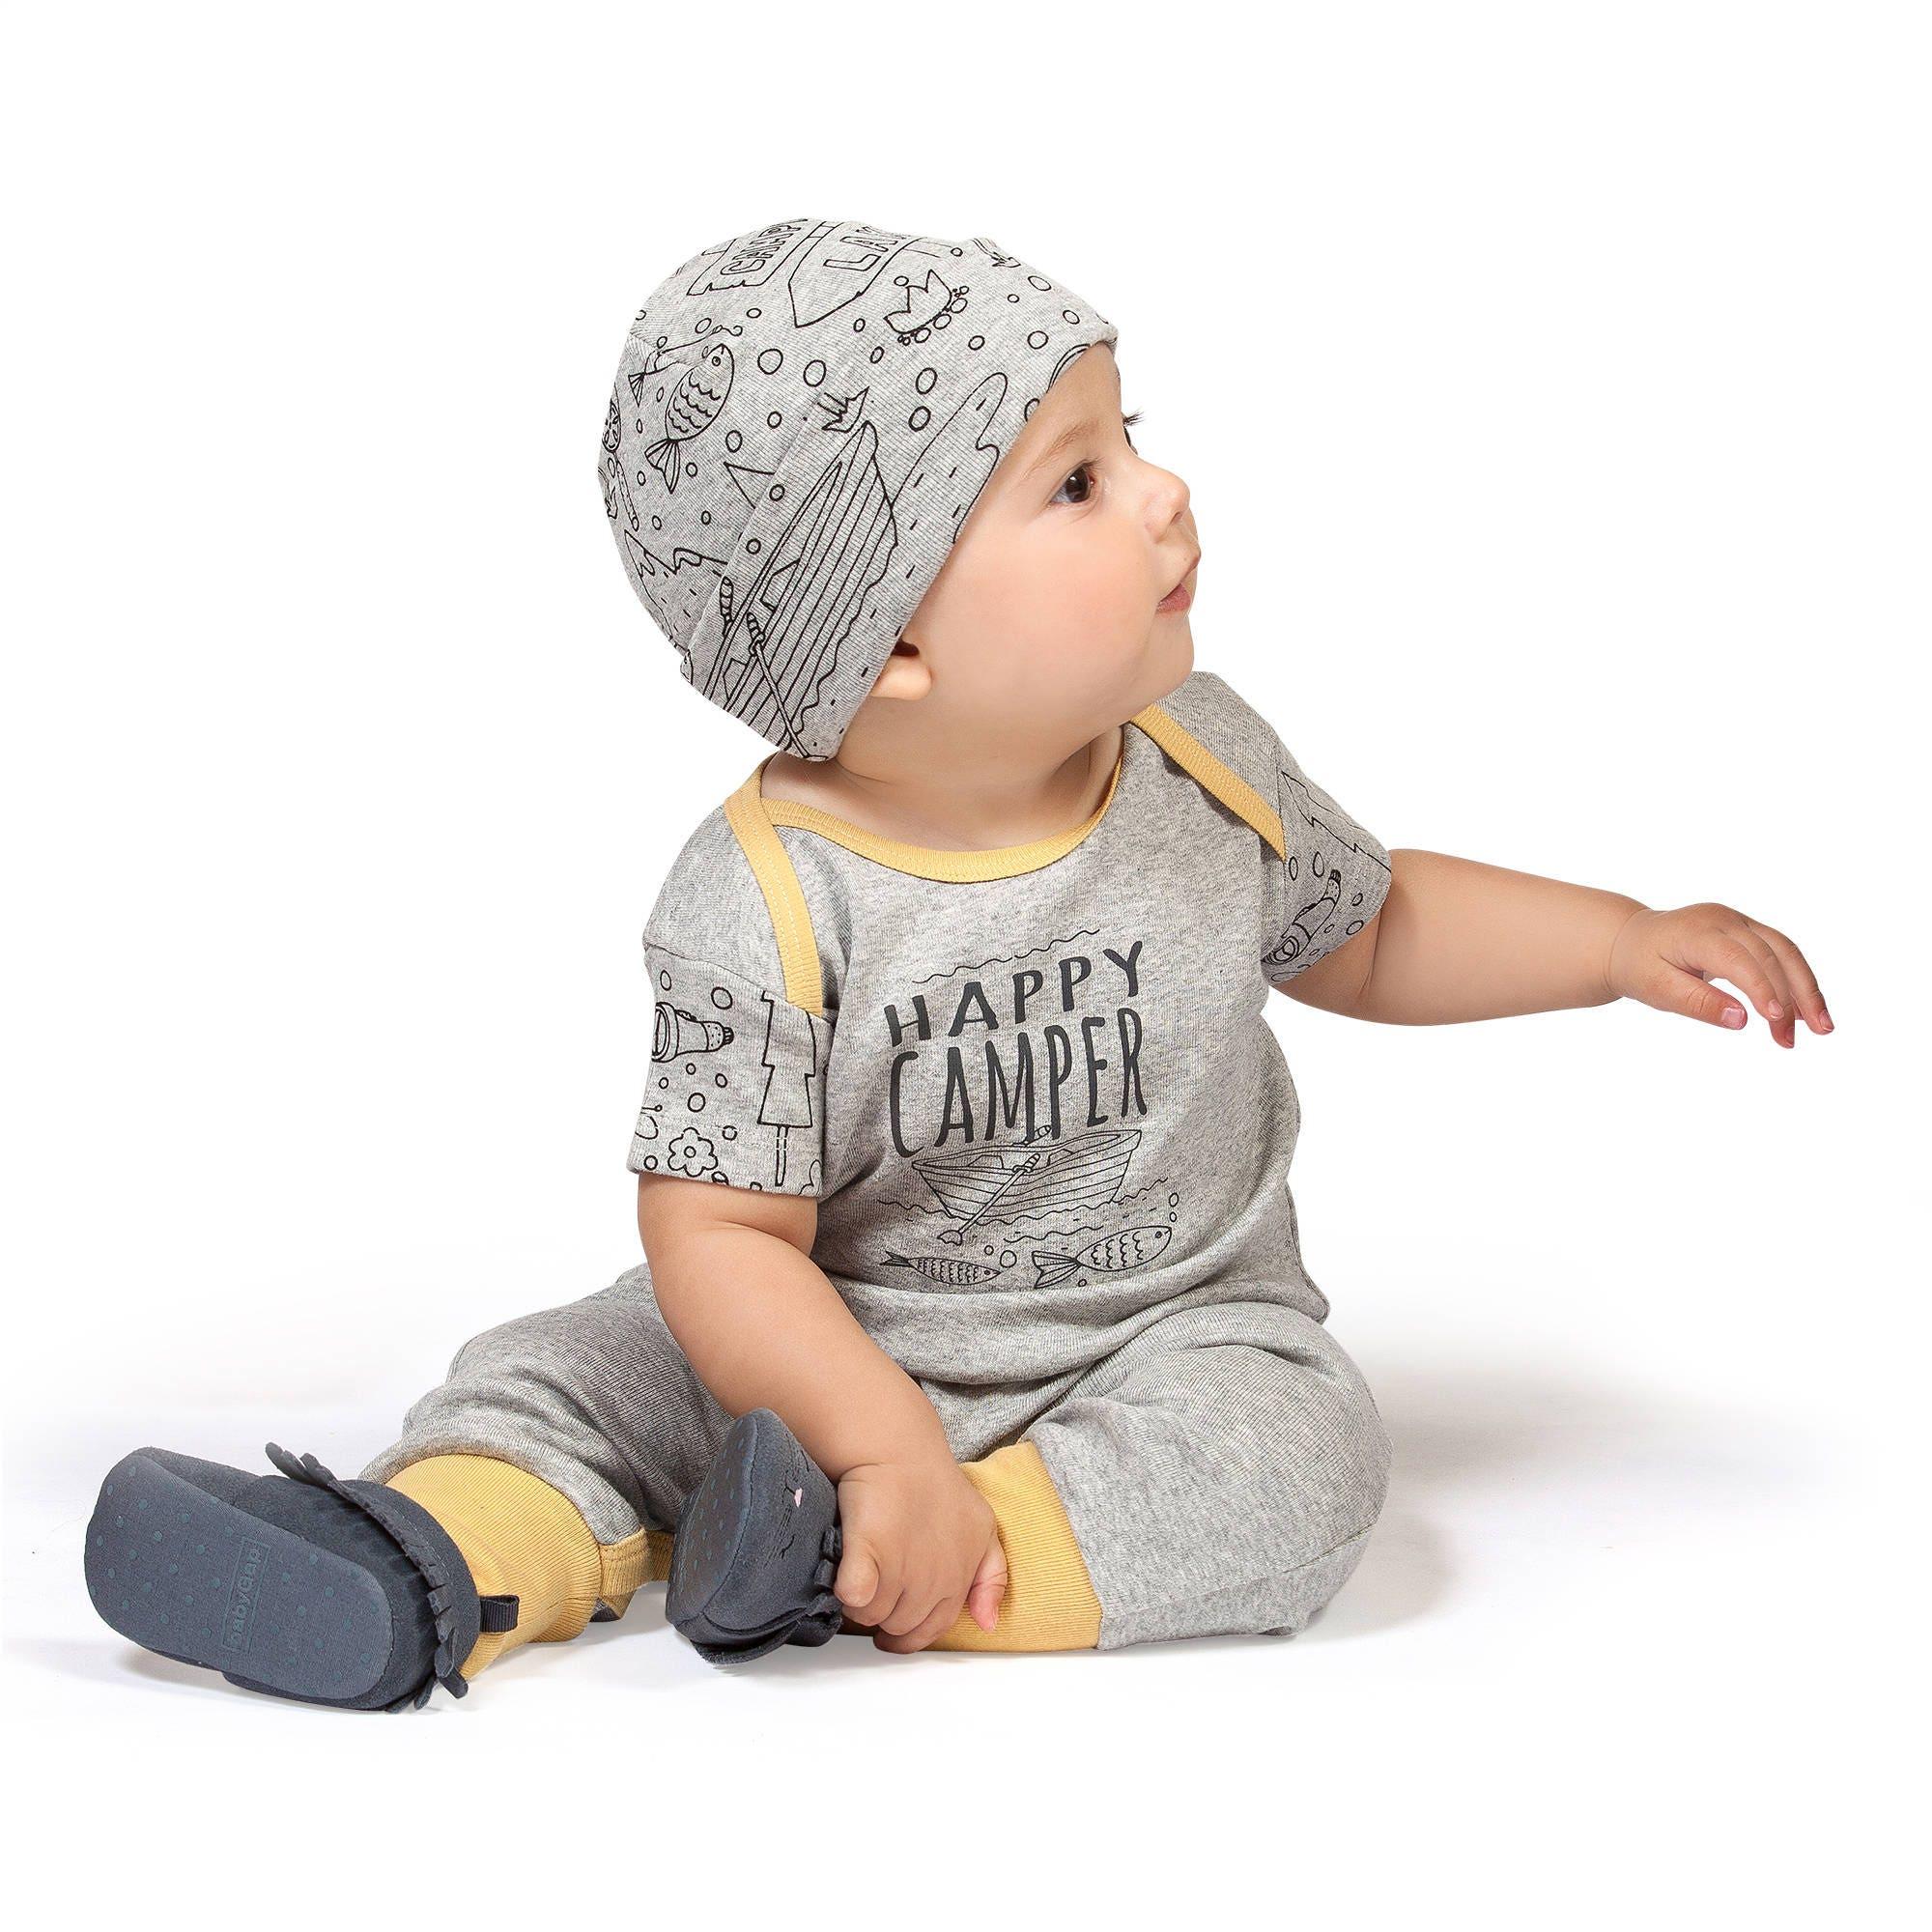 SPRING SALE Newborn Baby Boy Outfit Summer Baby Boy esie Outfit